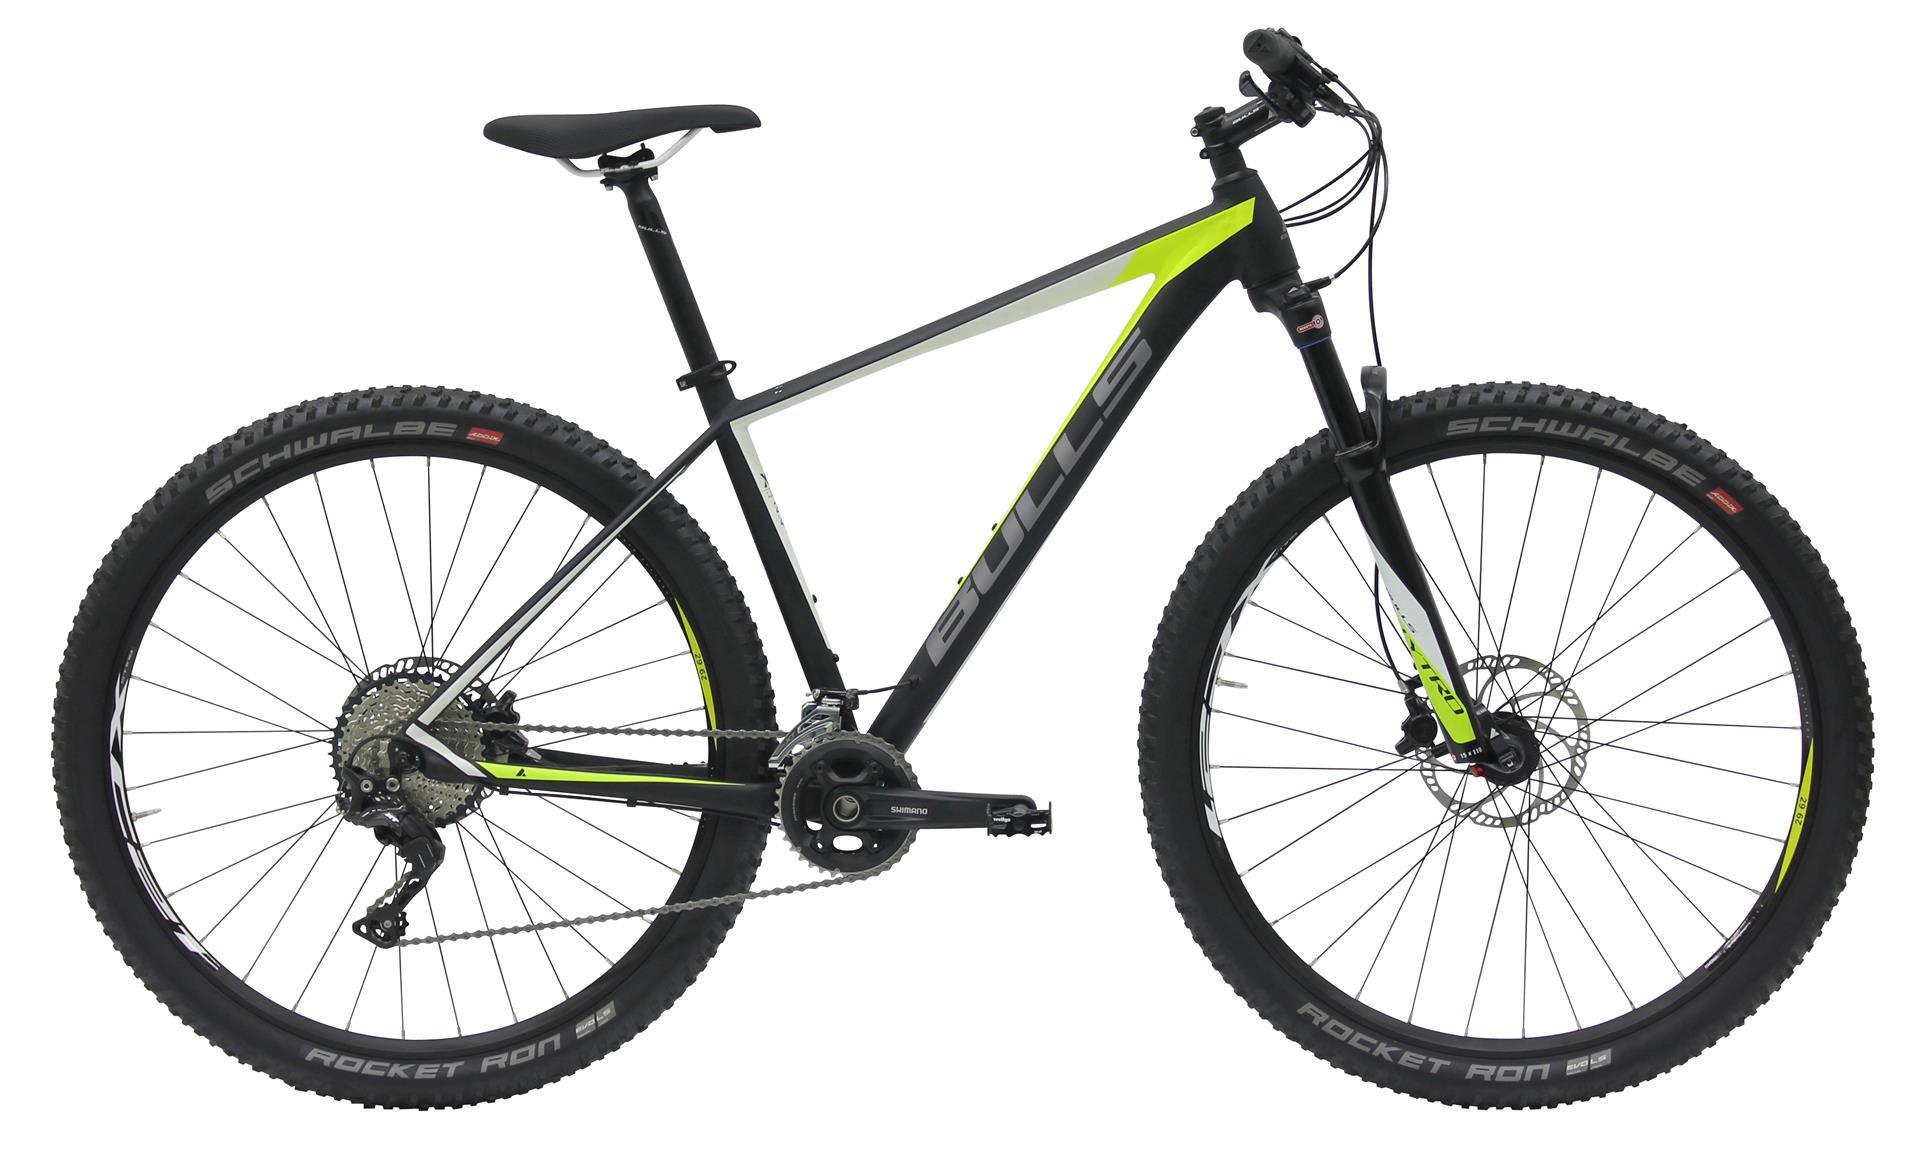 Bulls Copperhead 3 LT 29 schwarz-grün 2018 56cm